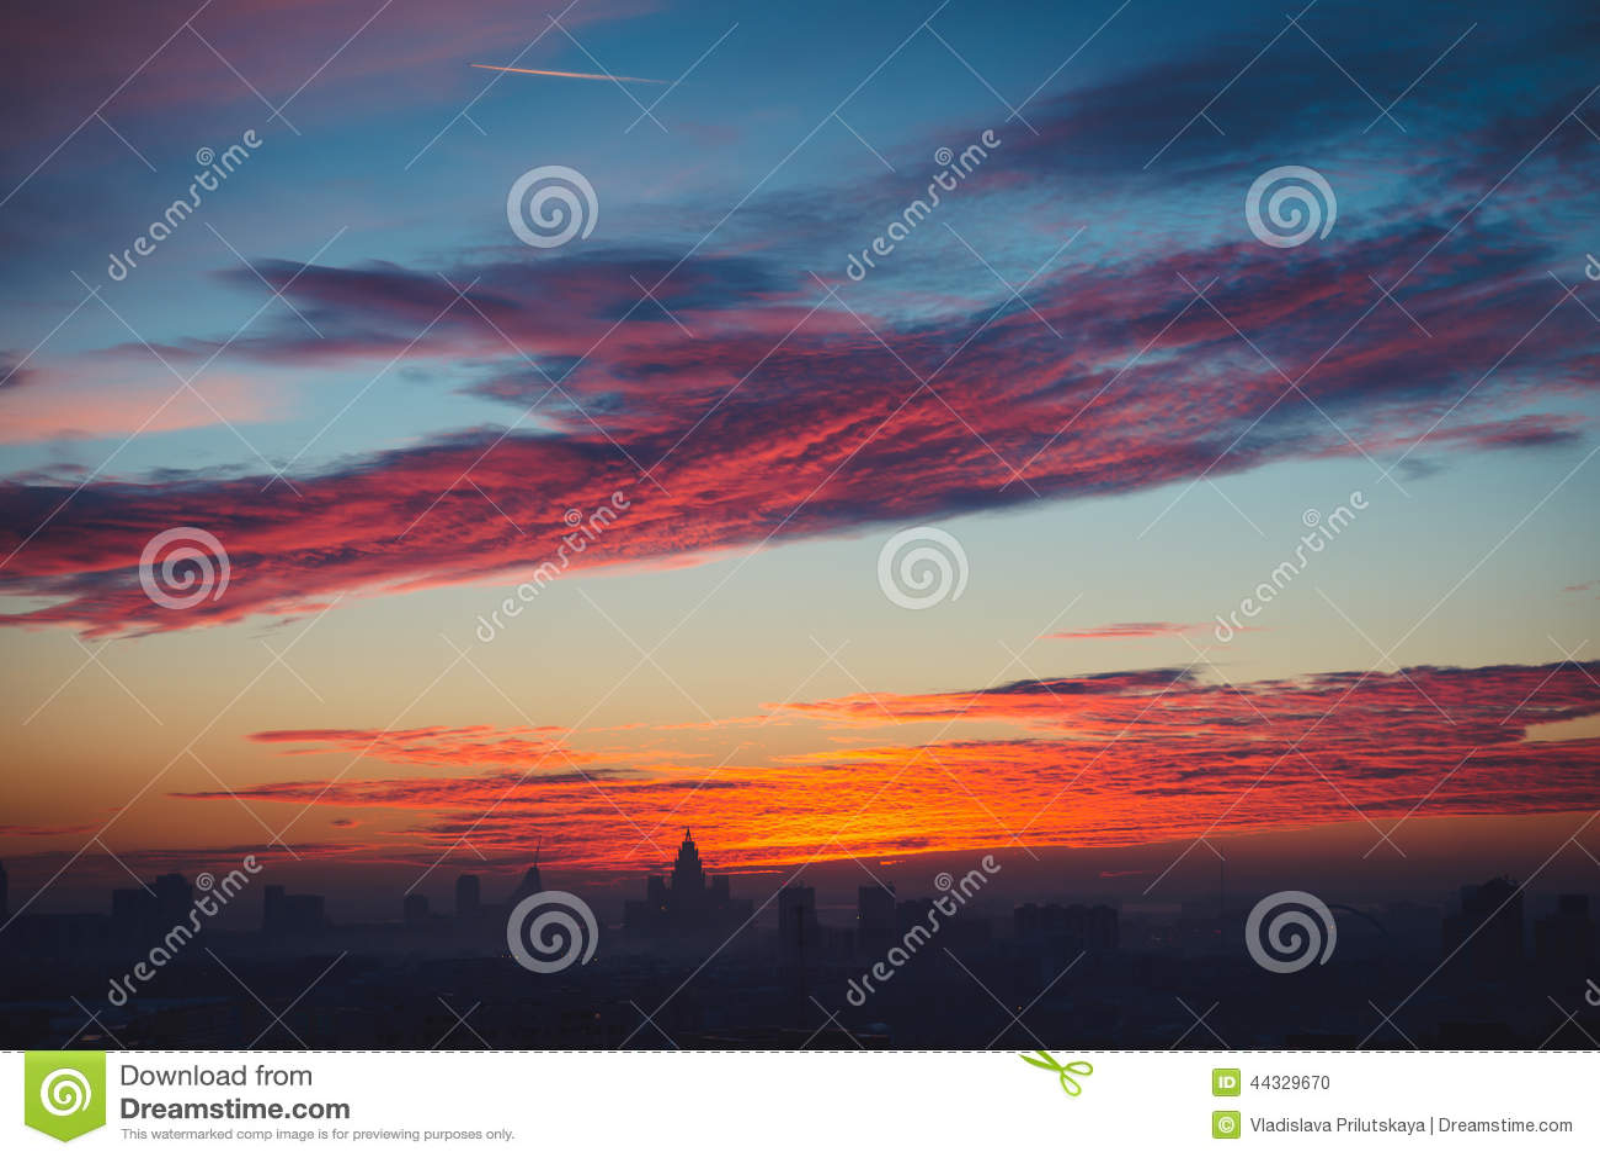 Spectacular view on sunset in Astana city, Kazakhstan